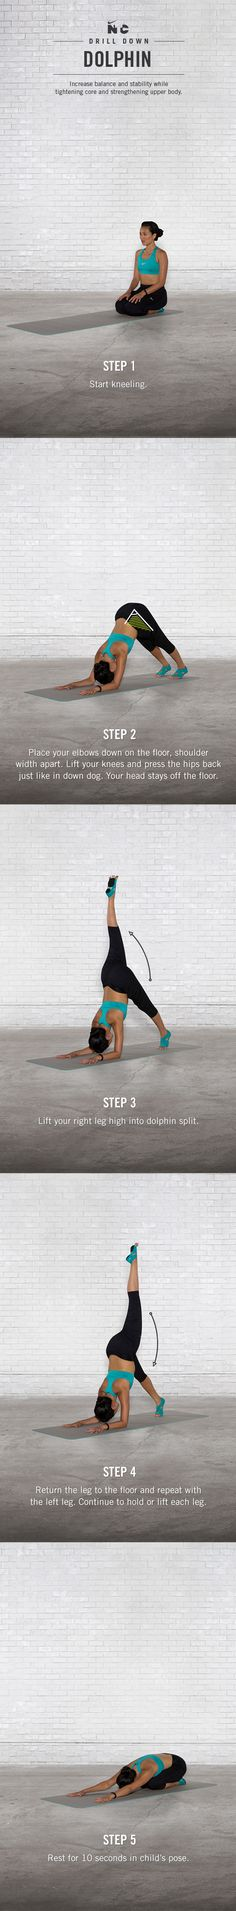 Dolphin Drill Down. #yoga #ntc #nike #stretch